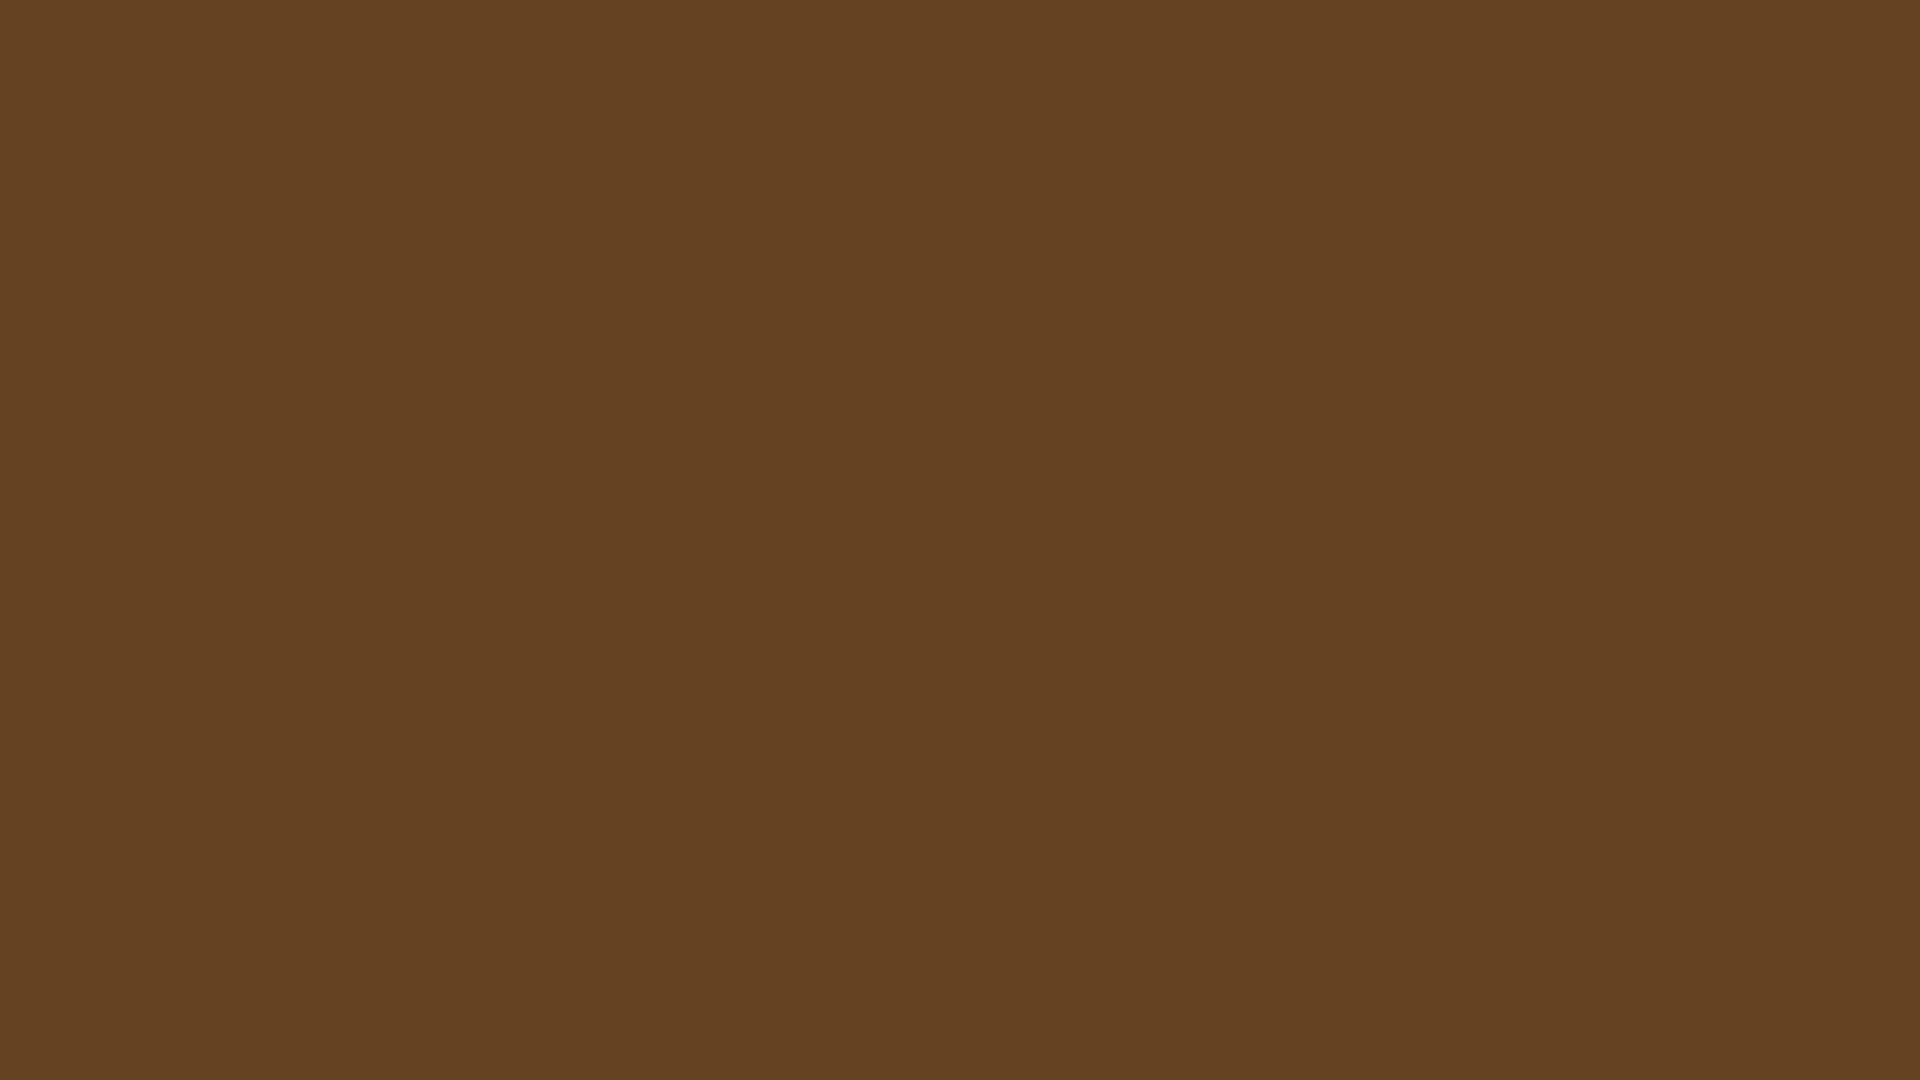 1920x1080 Dark Brown Solid Color Background